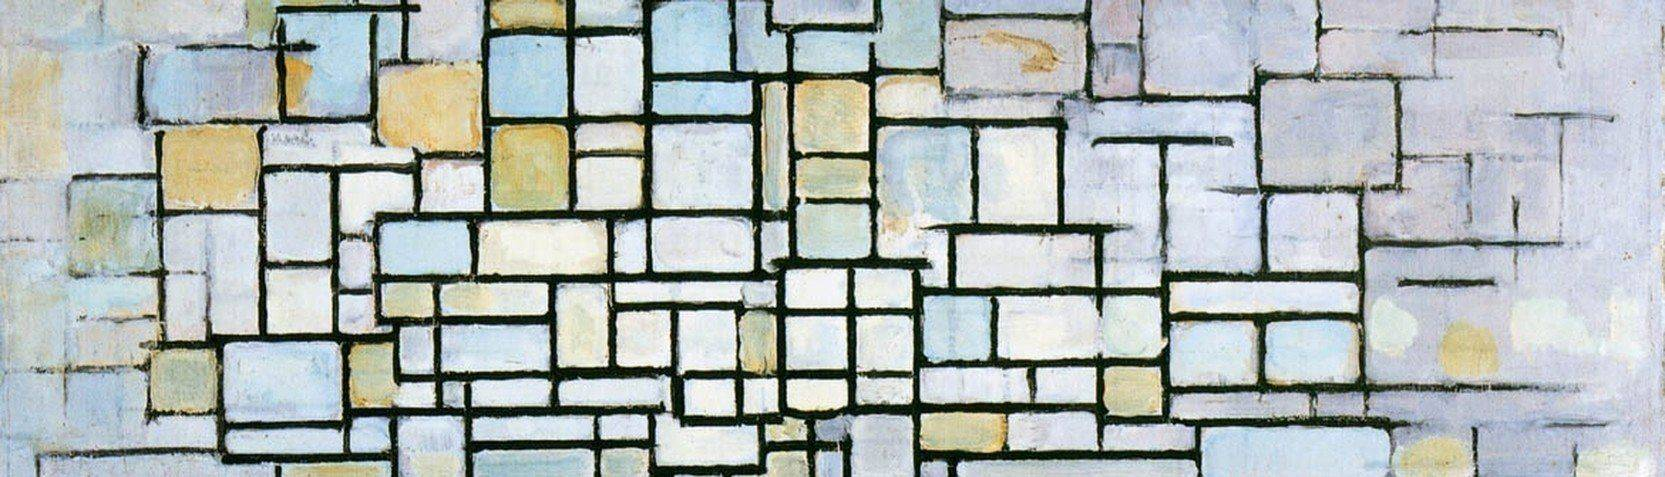 Artistas - Piet Mondrian